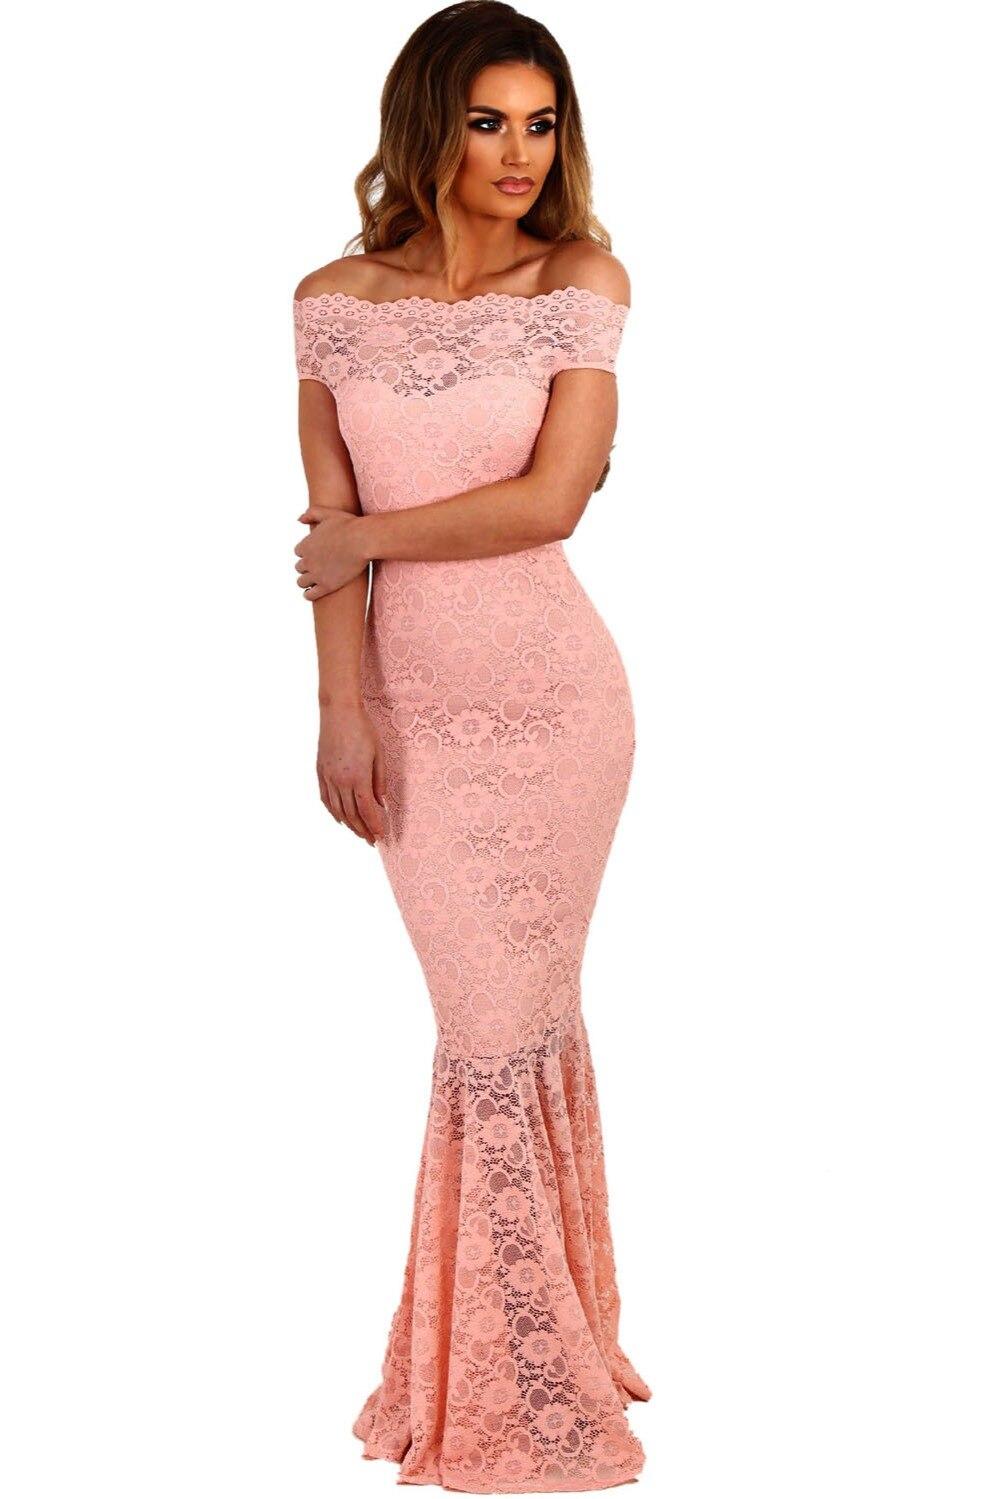 Navy short lace mini summer dress dresses elegant party vestidos brand - Women Lace Dresses Party Gowns Sexy Off Shoulder Ladies Robe De Soiree Navy Fishtail Maxi Dress